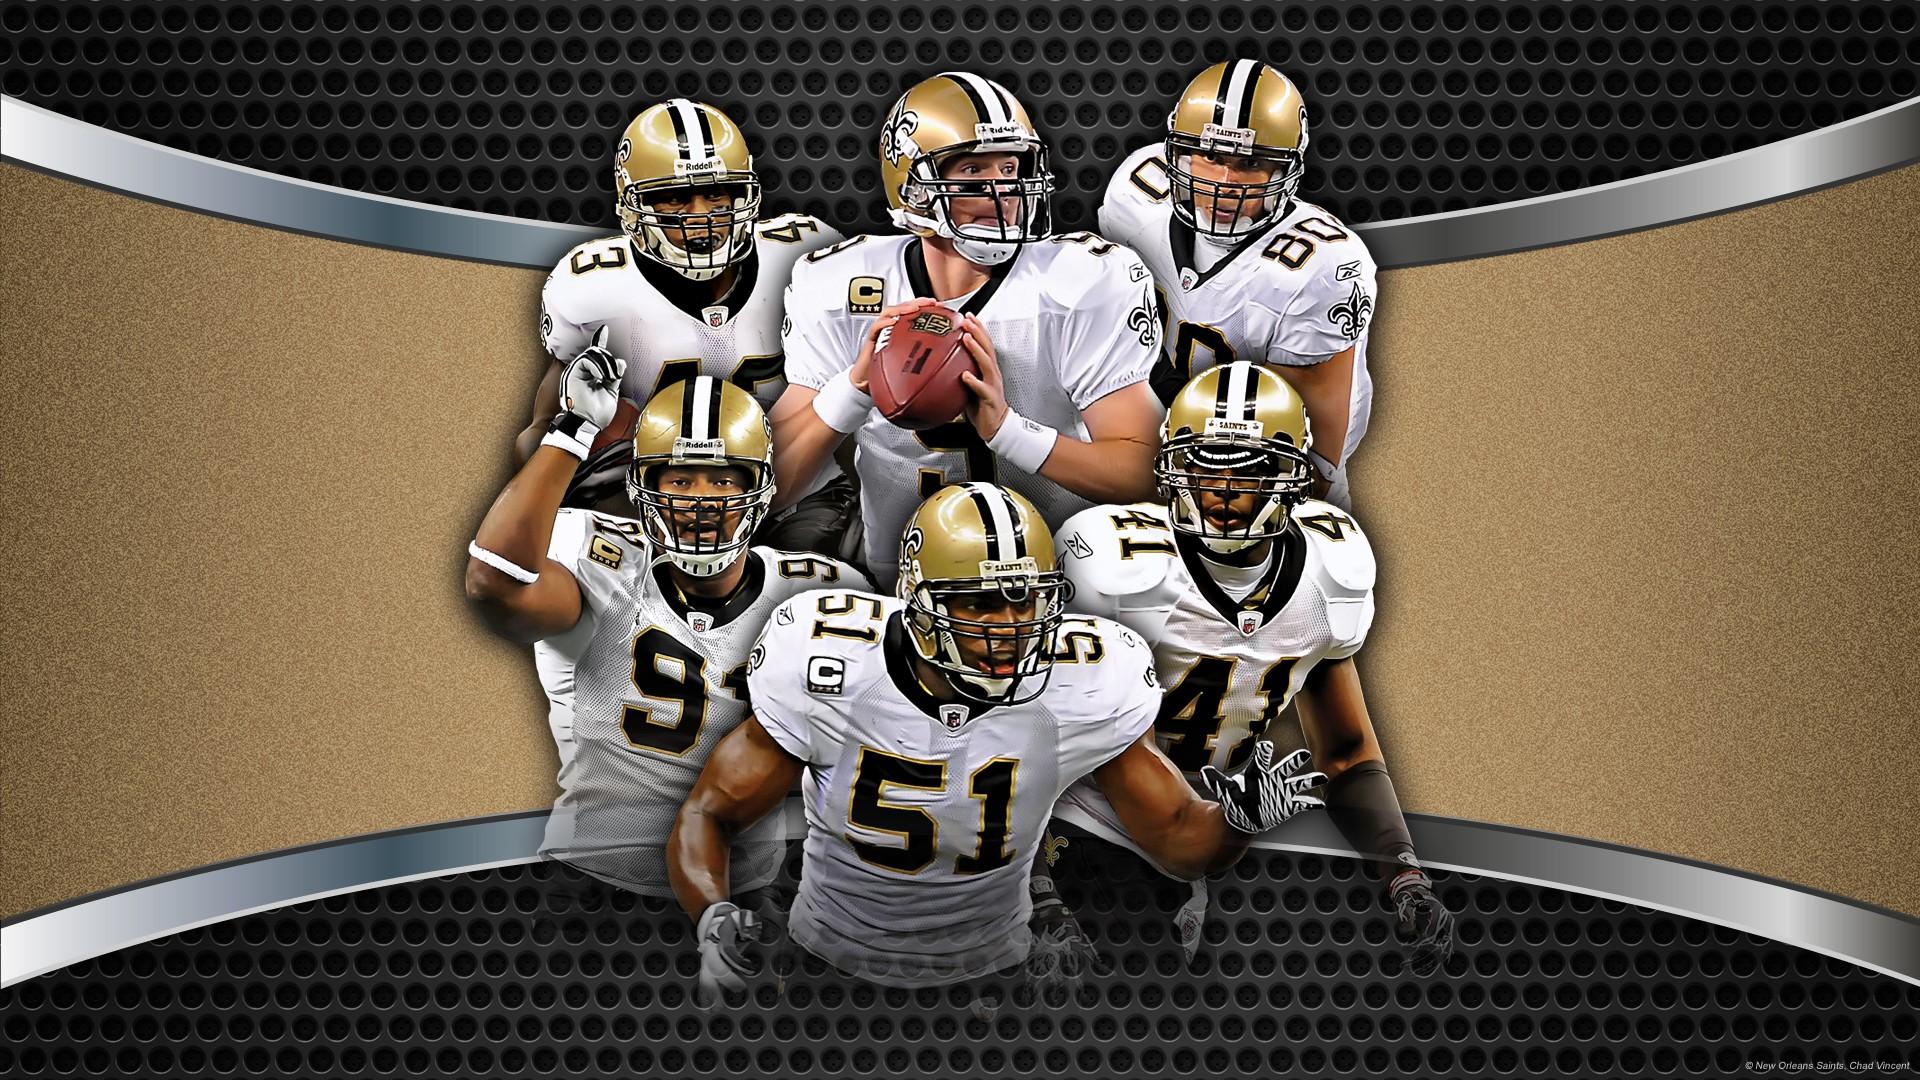 New Orleans Saints Wallpaper 2021 NFL Football Wallpapers 1920x1080